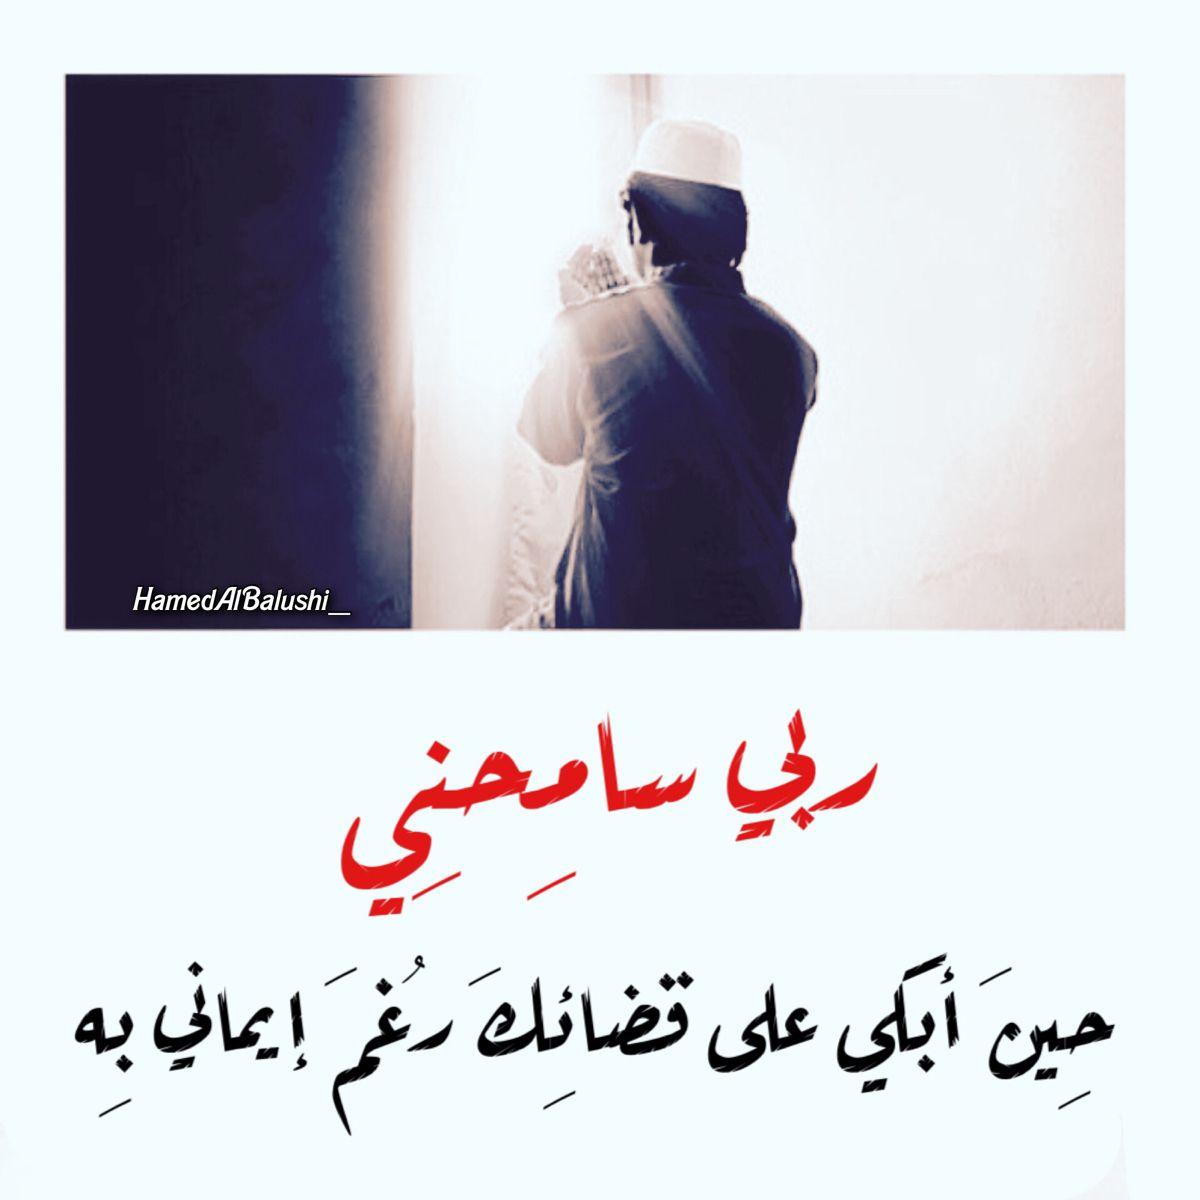 ربي سامحني Calligraphy Arabic Calligraphy Movie Posters